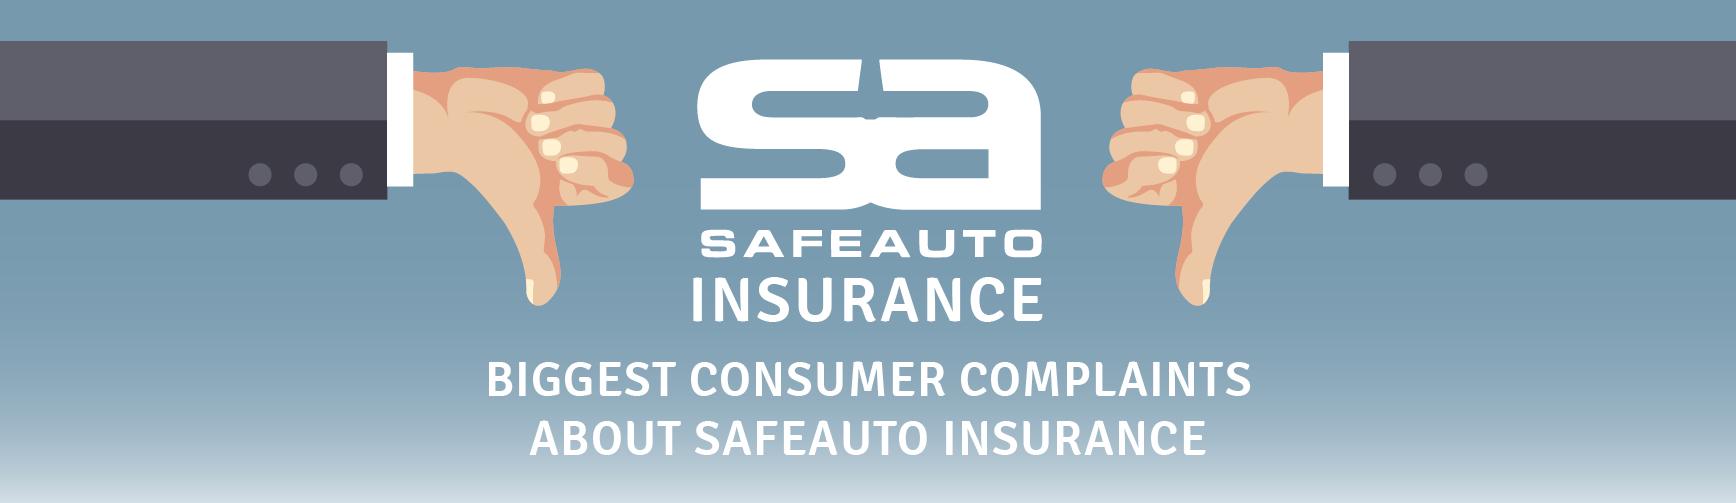 safeauto insurance quote photo - 1